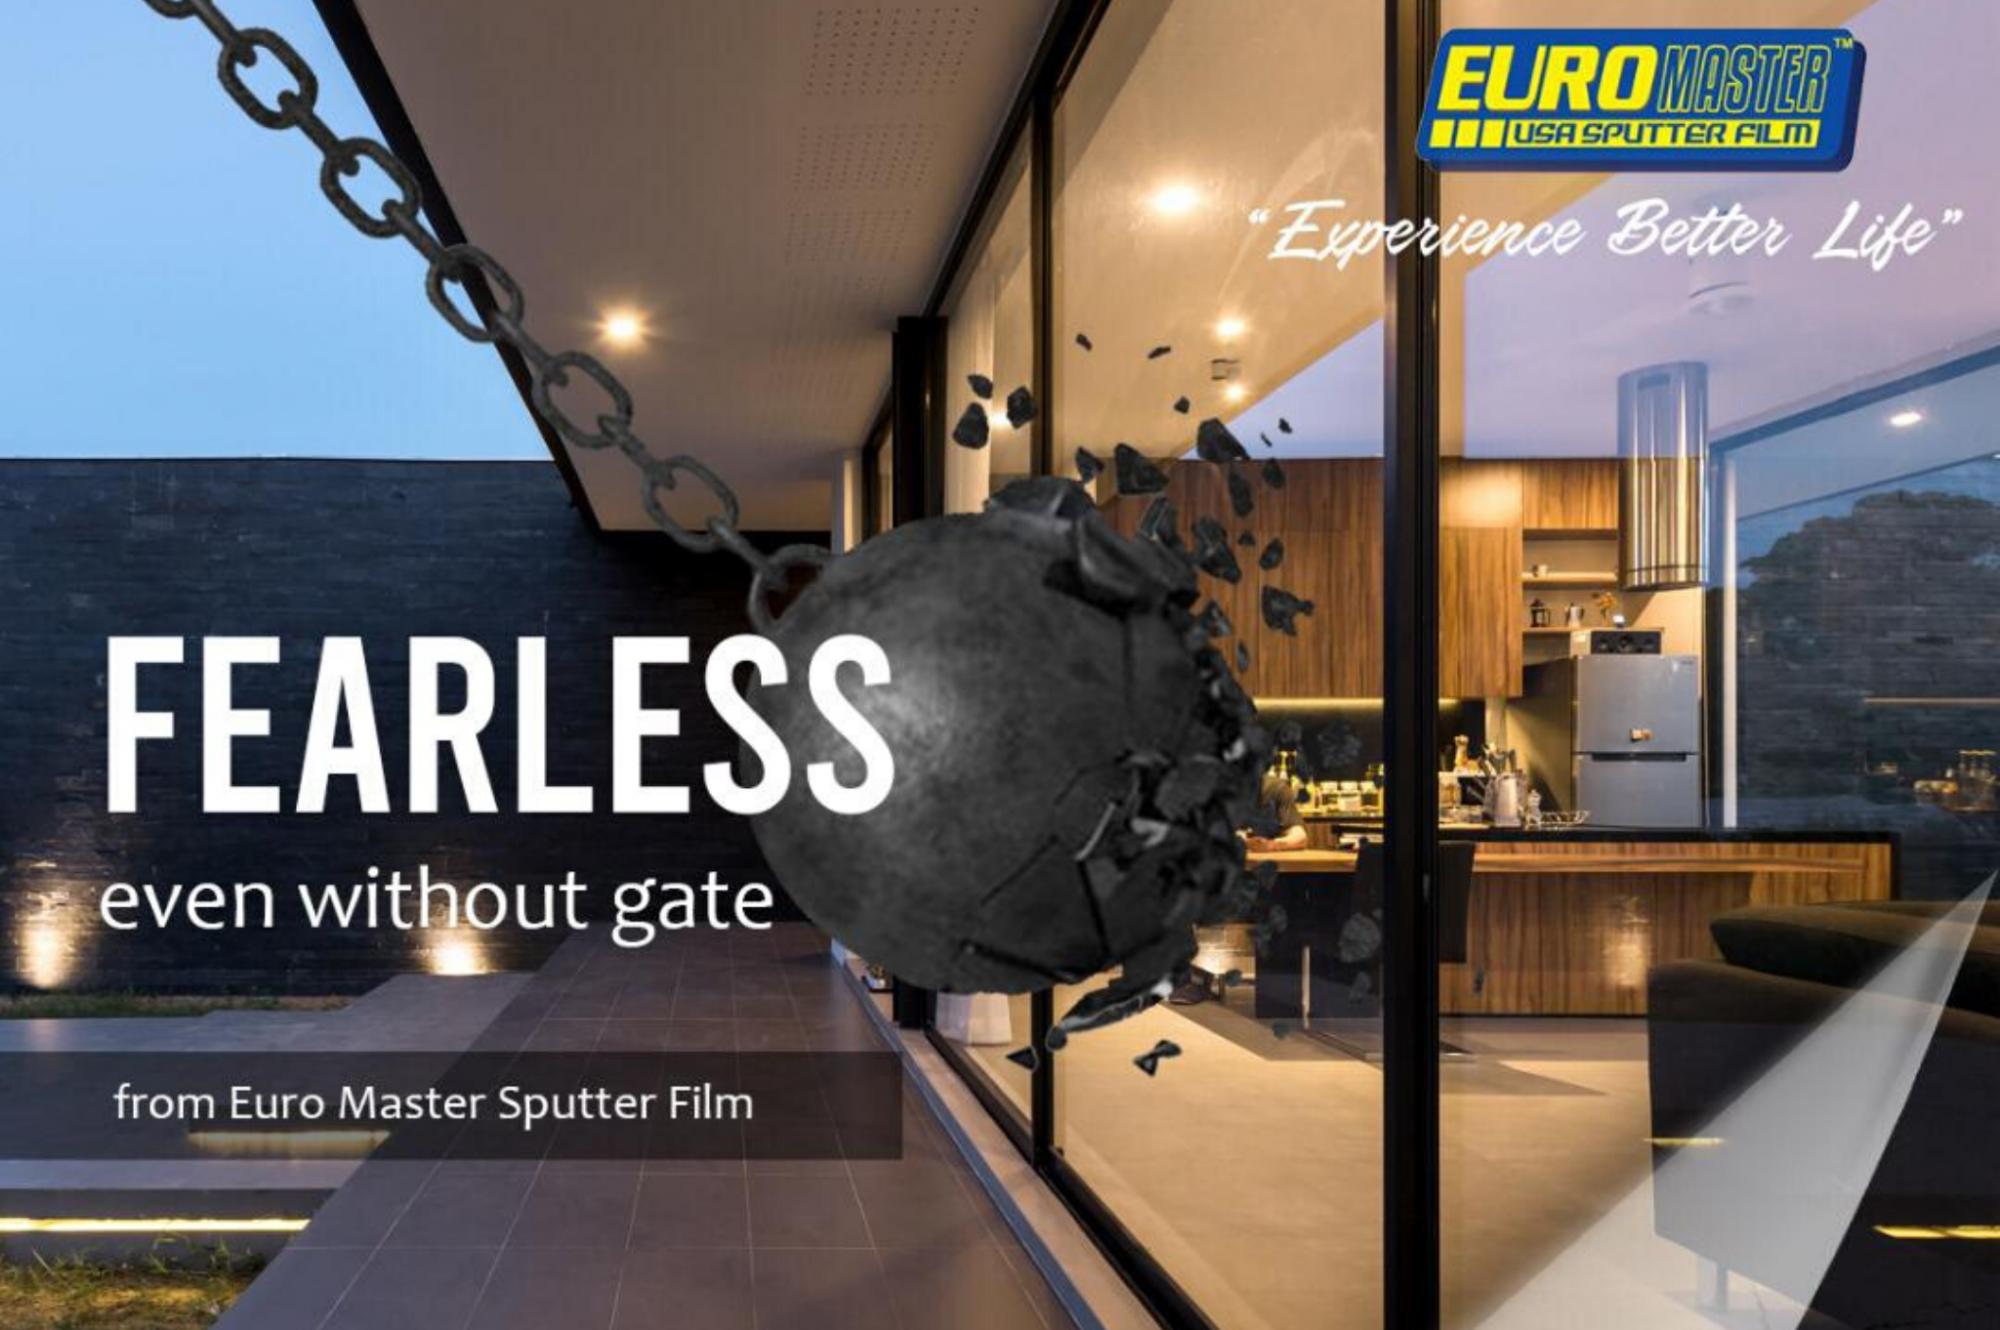 Euromaster USA Sputter Flim